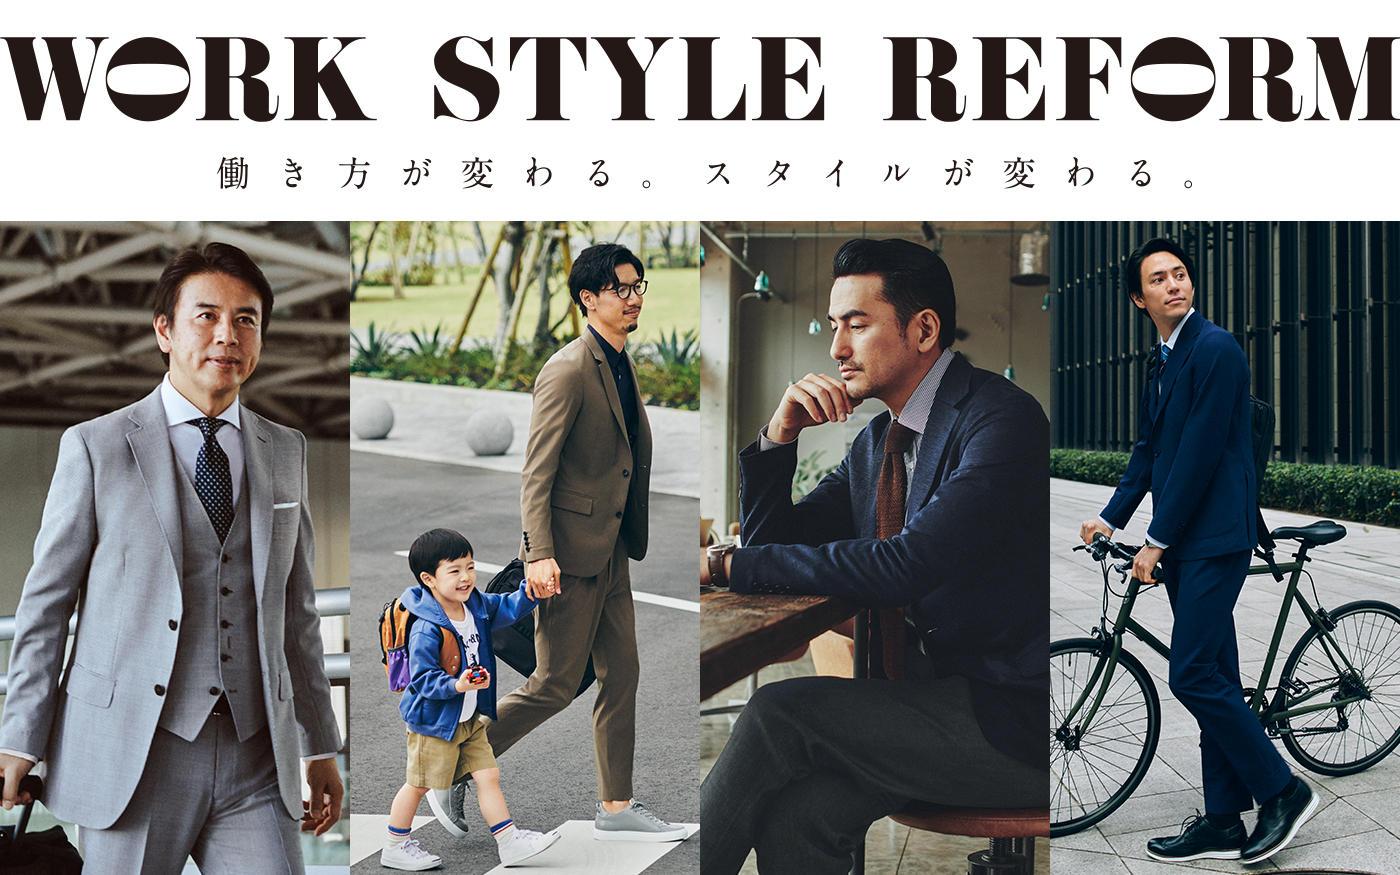 WORK STYLE REFORM ー ||働き方が変わる。スタイルが変わる。vol.1